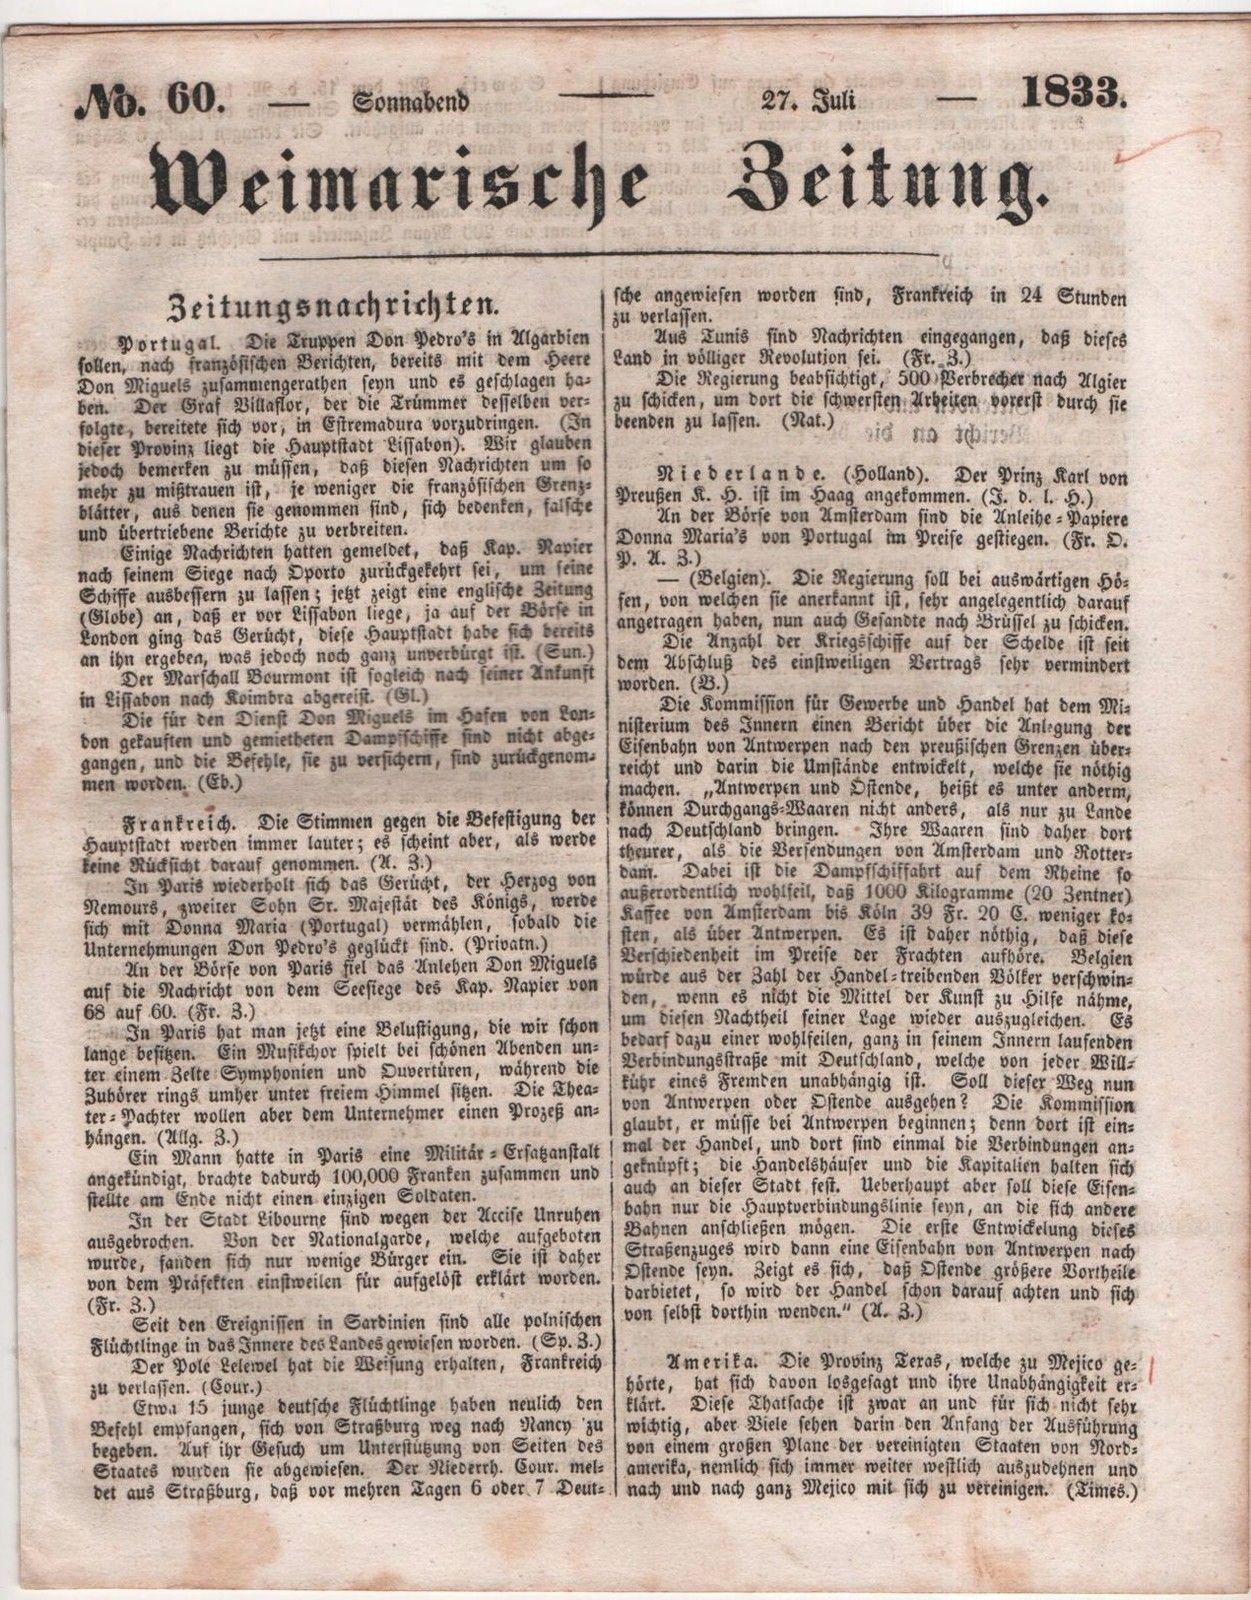 Weimarische Zeitung